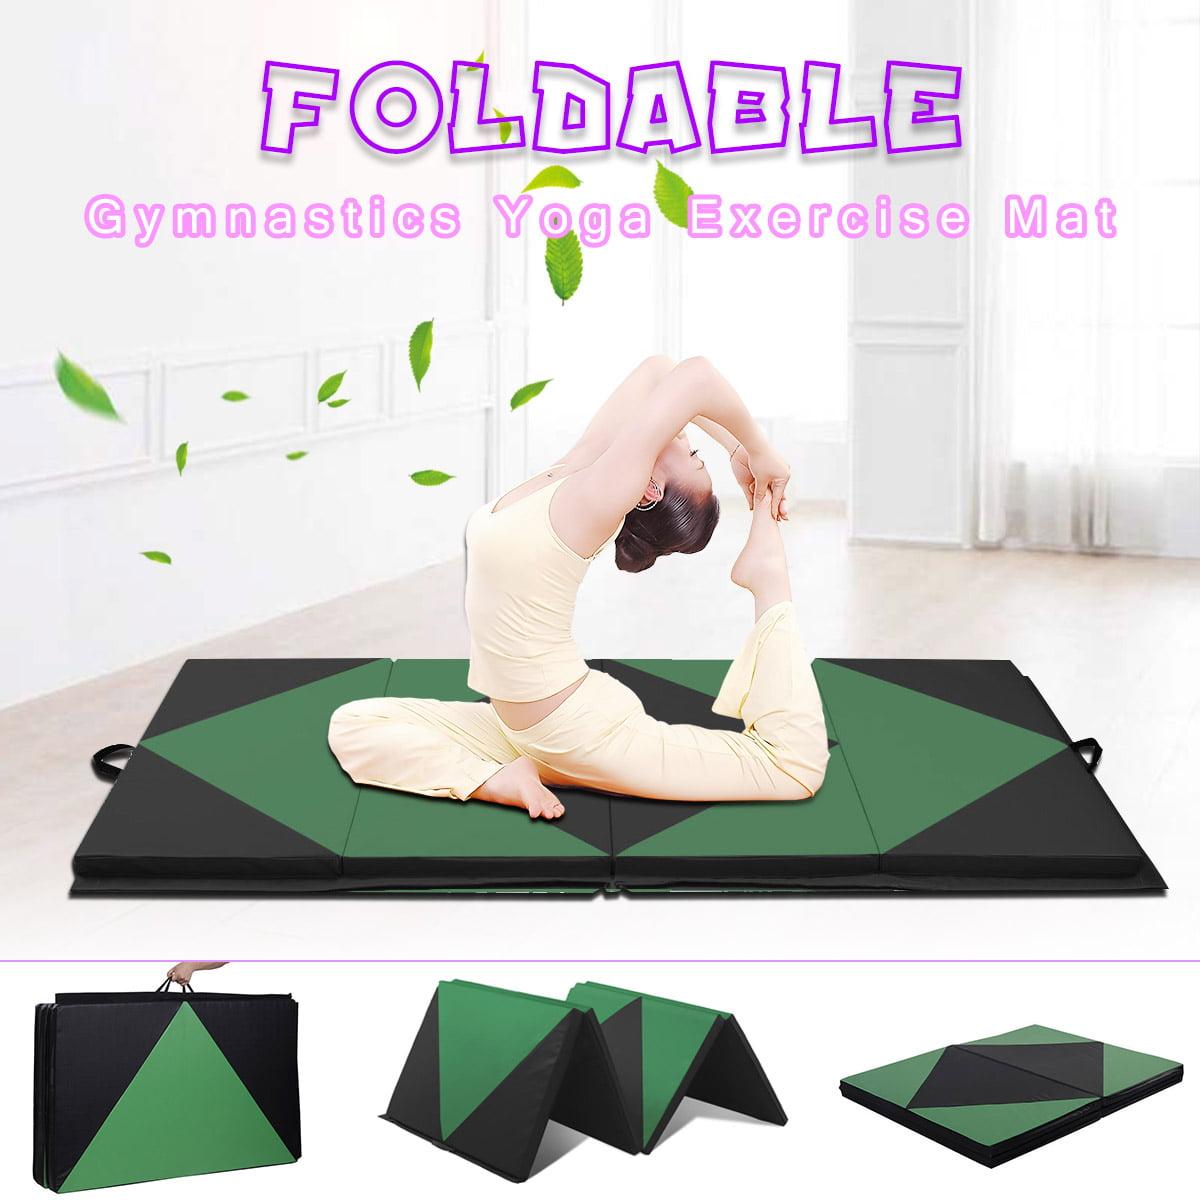 Large Folding Panel Yoga Mat Exercise Sport Gymnastics Thick Gym Fitness Large Tumbling Mat 8'x4'x2''